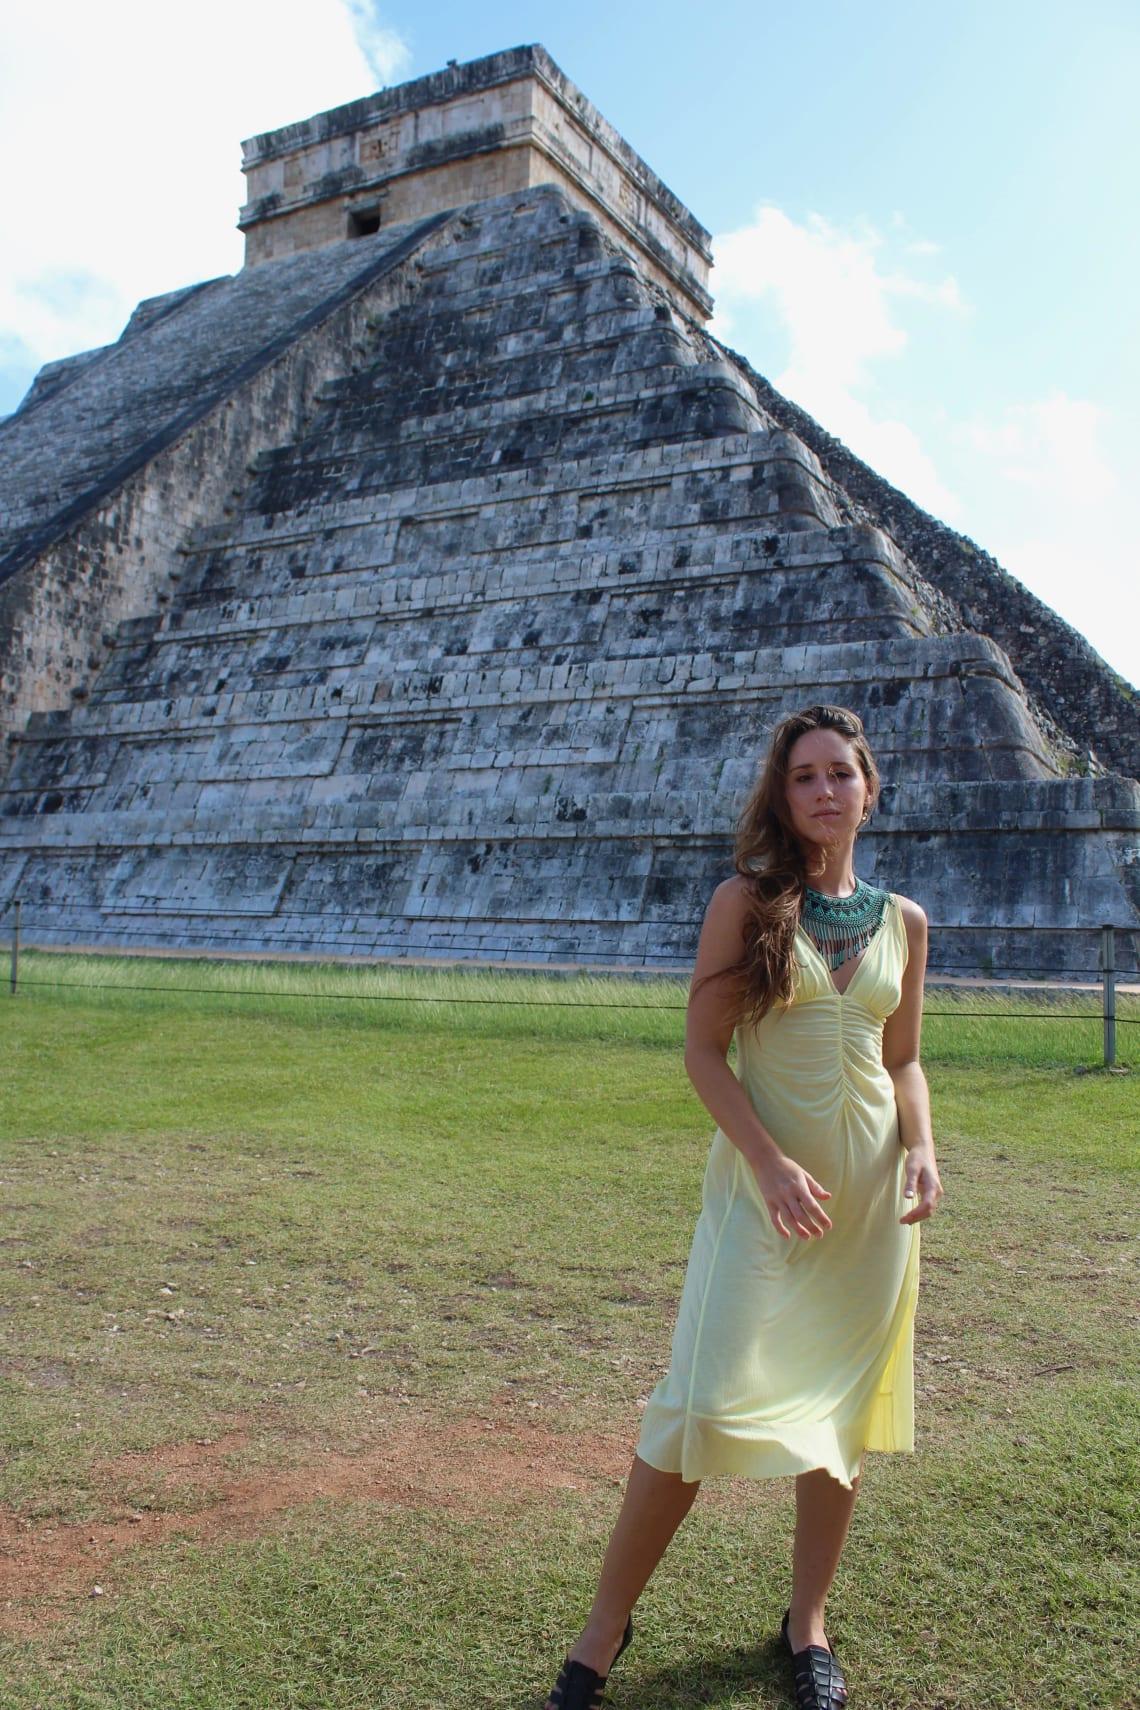 Travel as education: Chichen Itza, Mexico